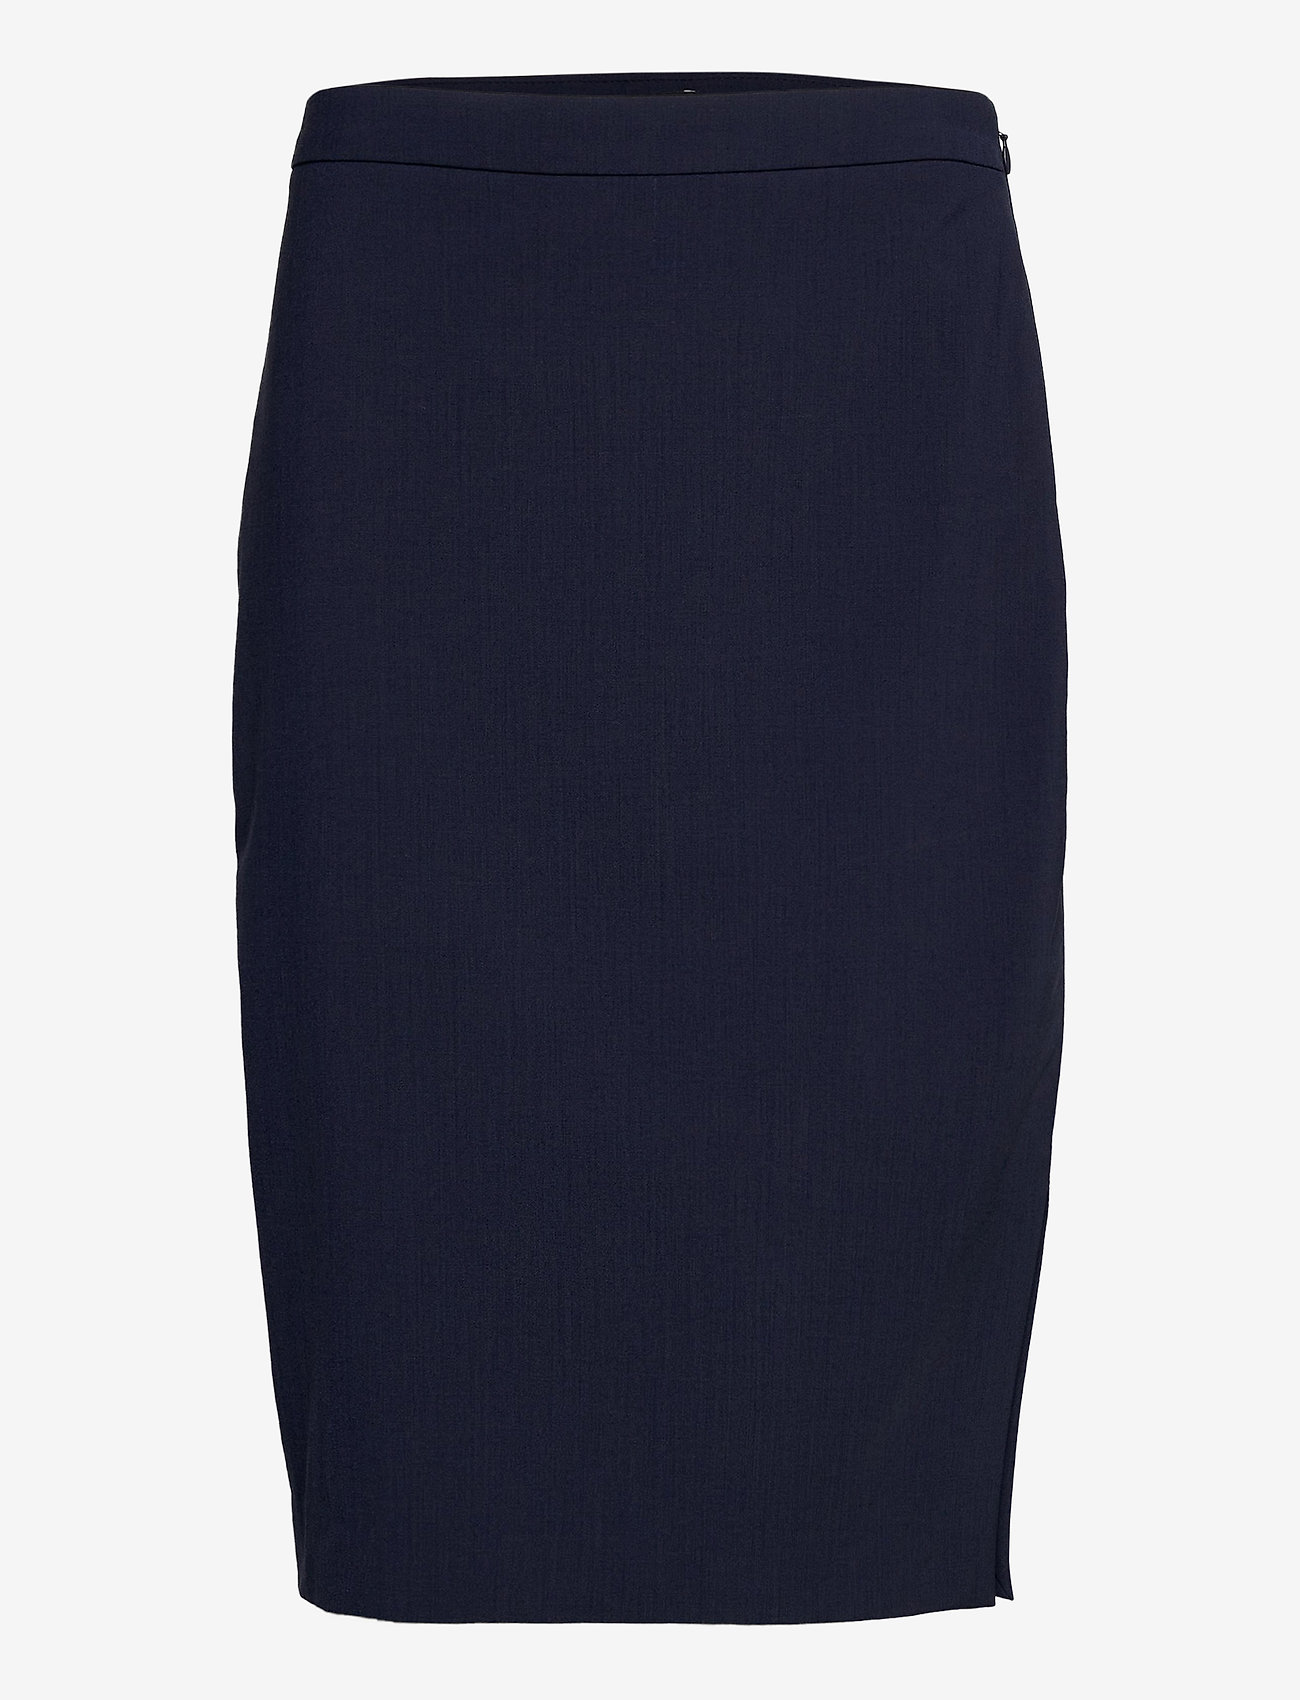 Banana Republic - Washable Italian Wool-Blend Pencil Skirt with Side Slit - midi skirts - navy - 0